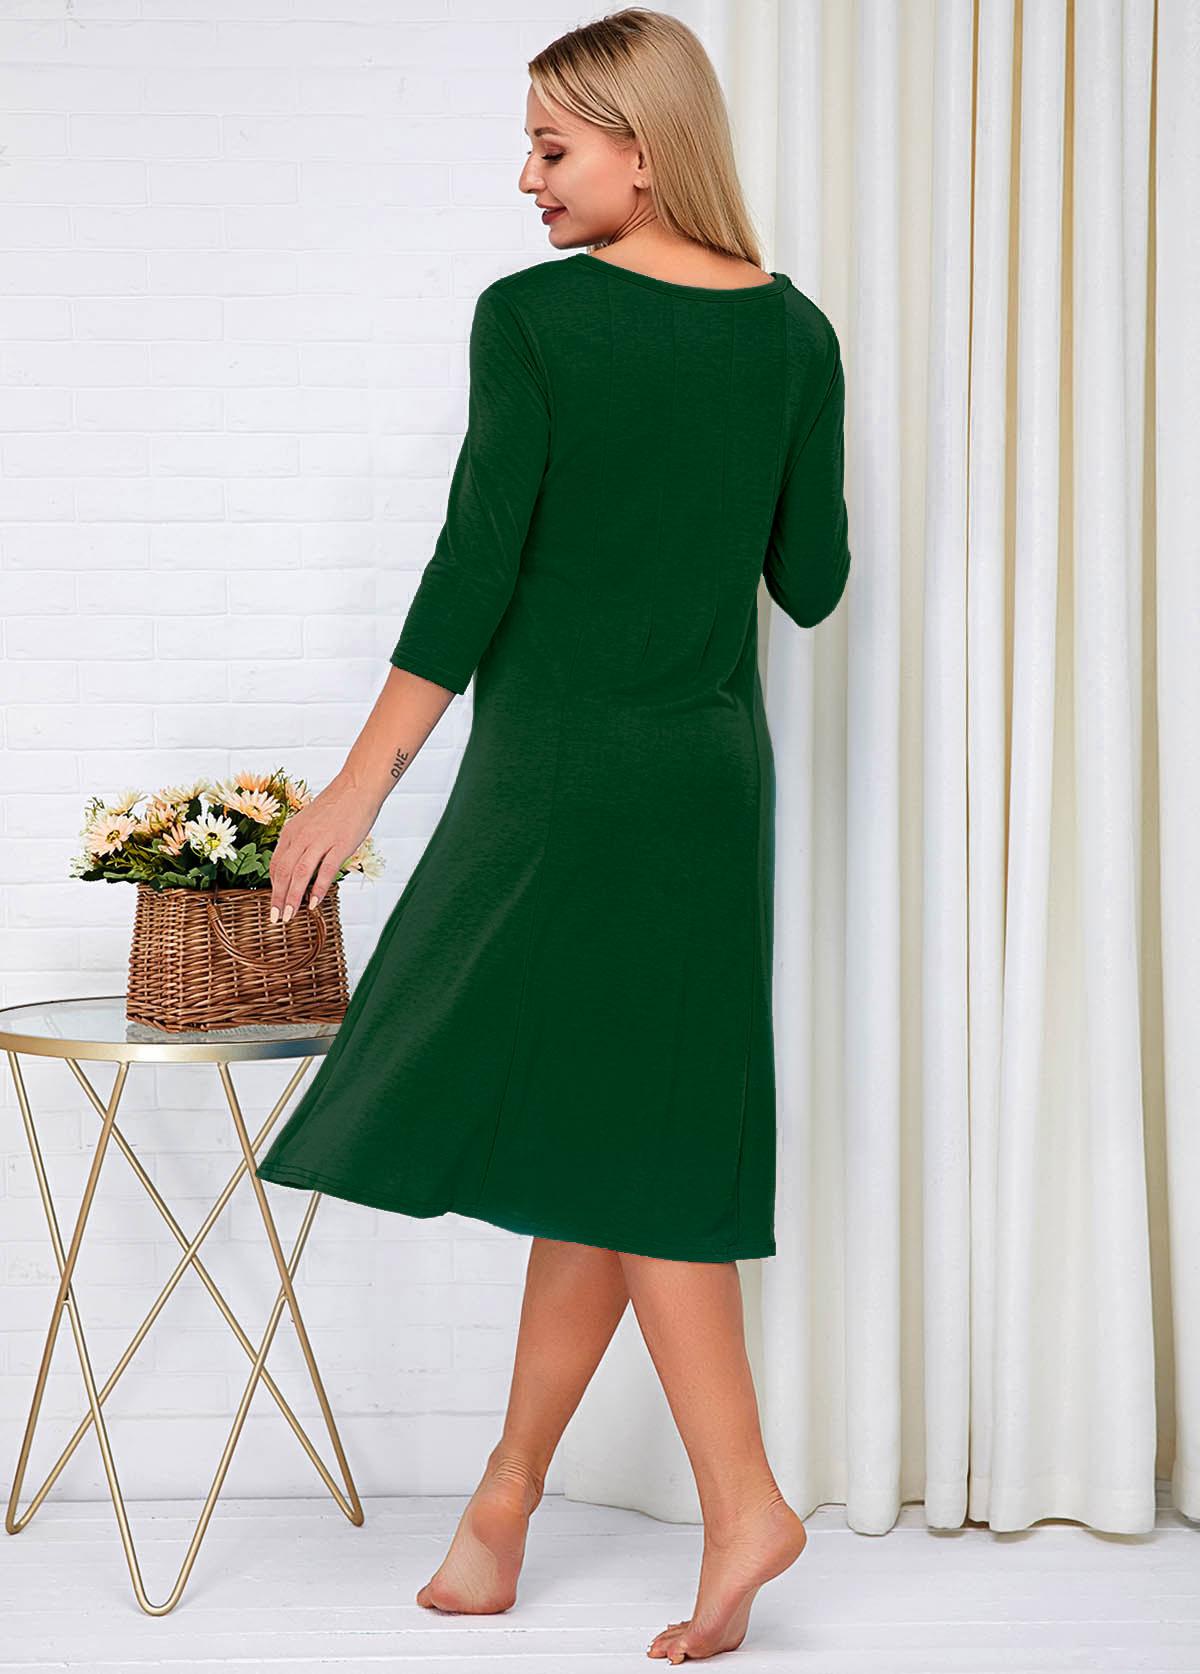 Round Neck Three Quarter Sleeve Green Dress